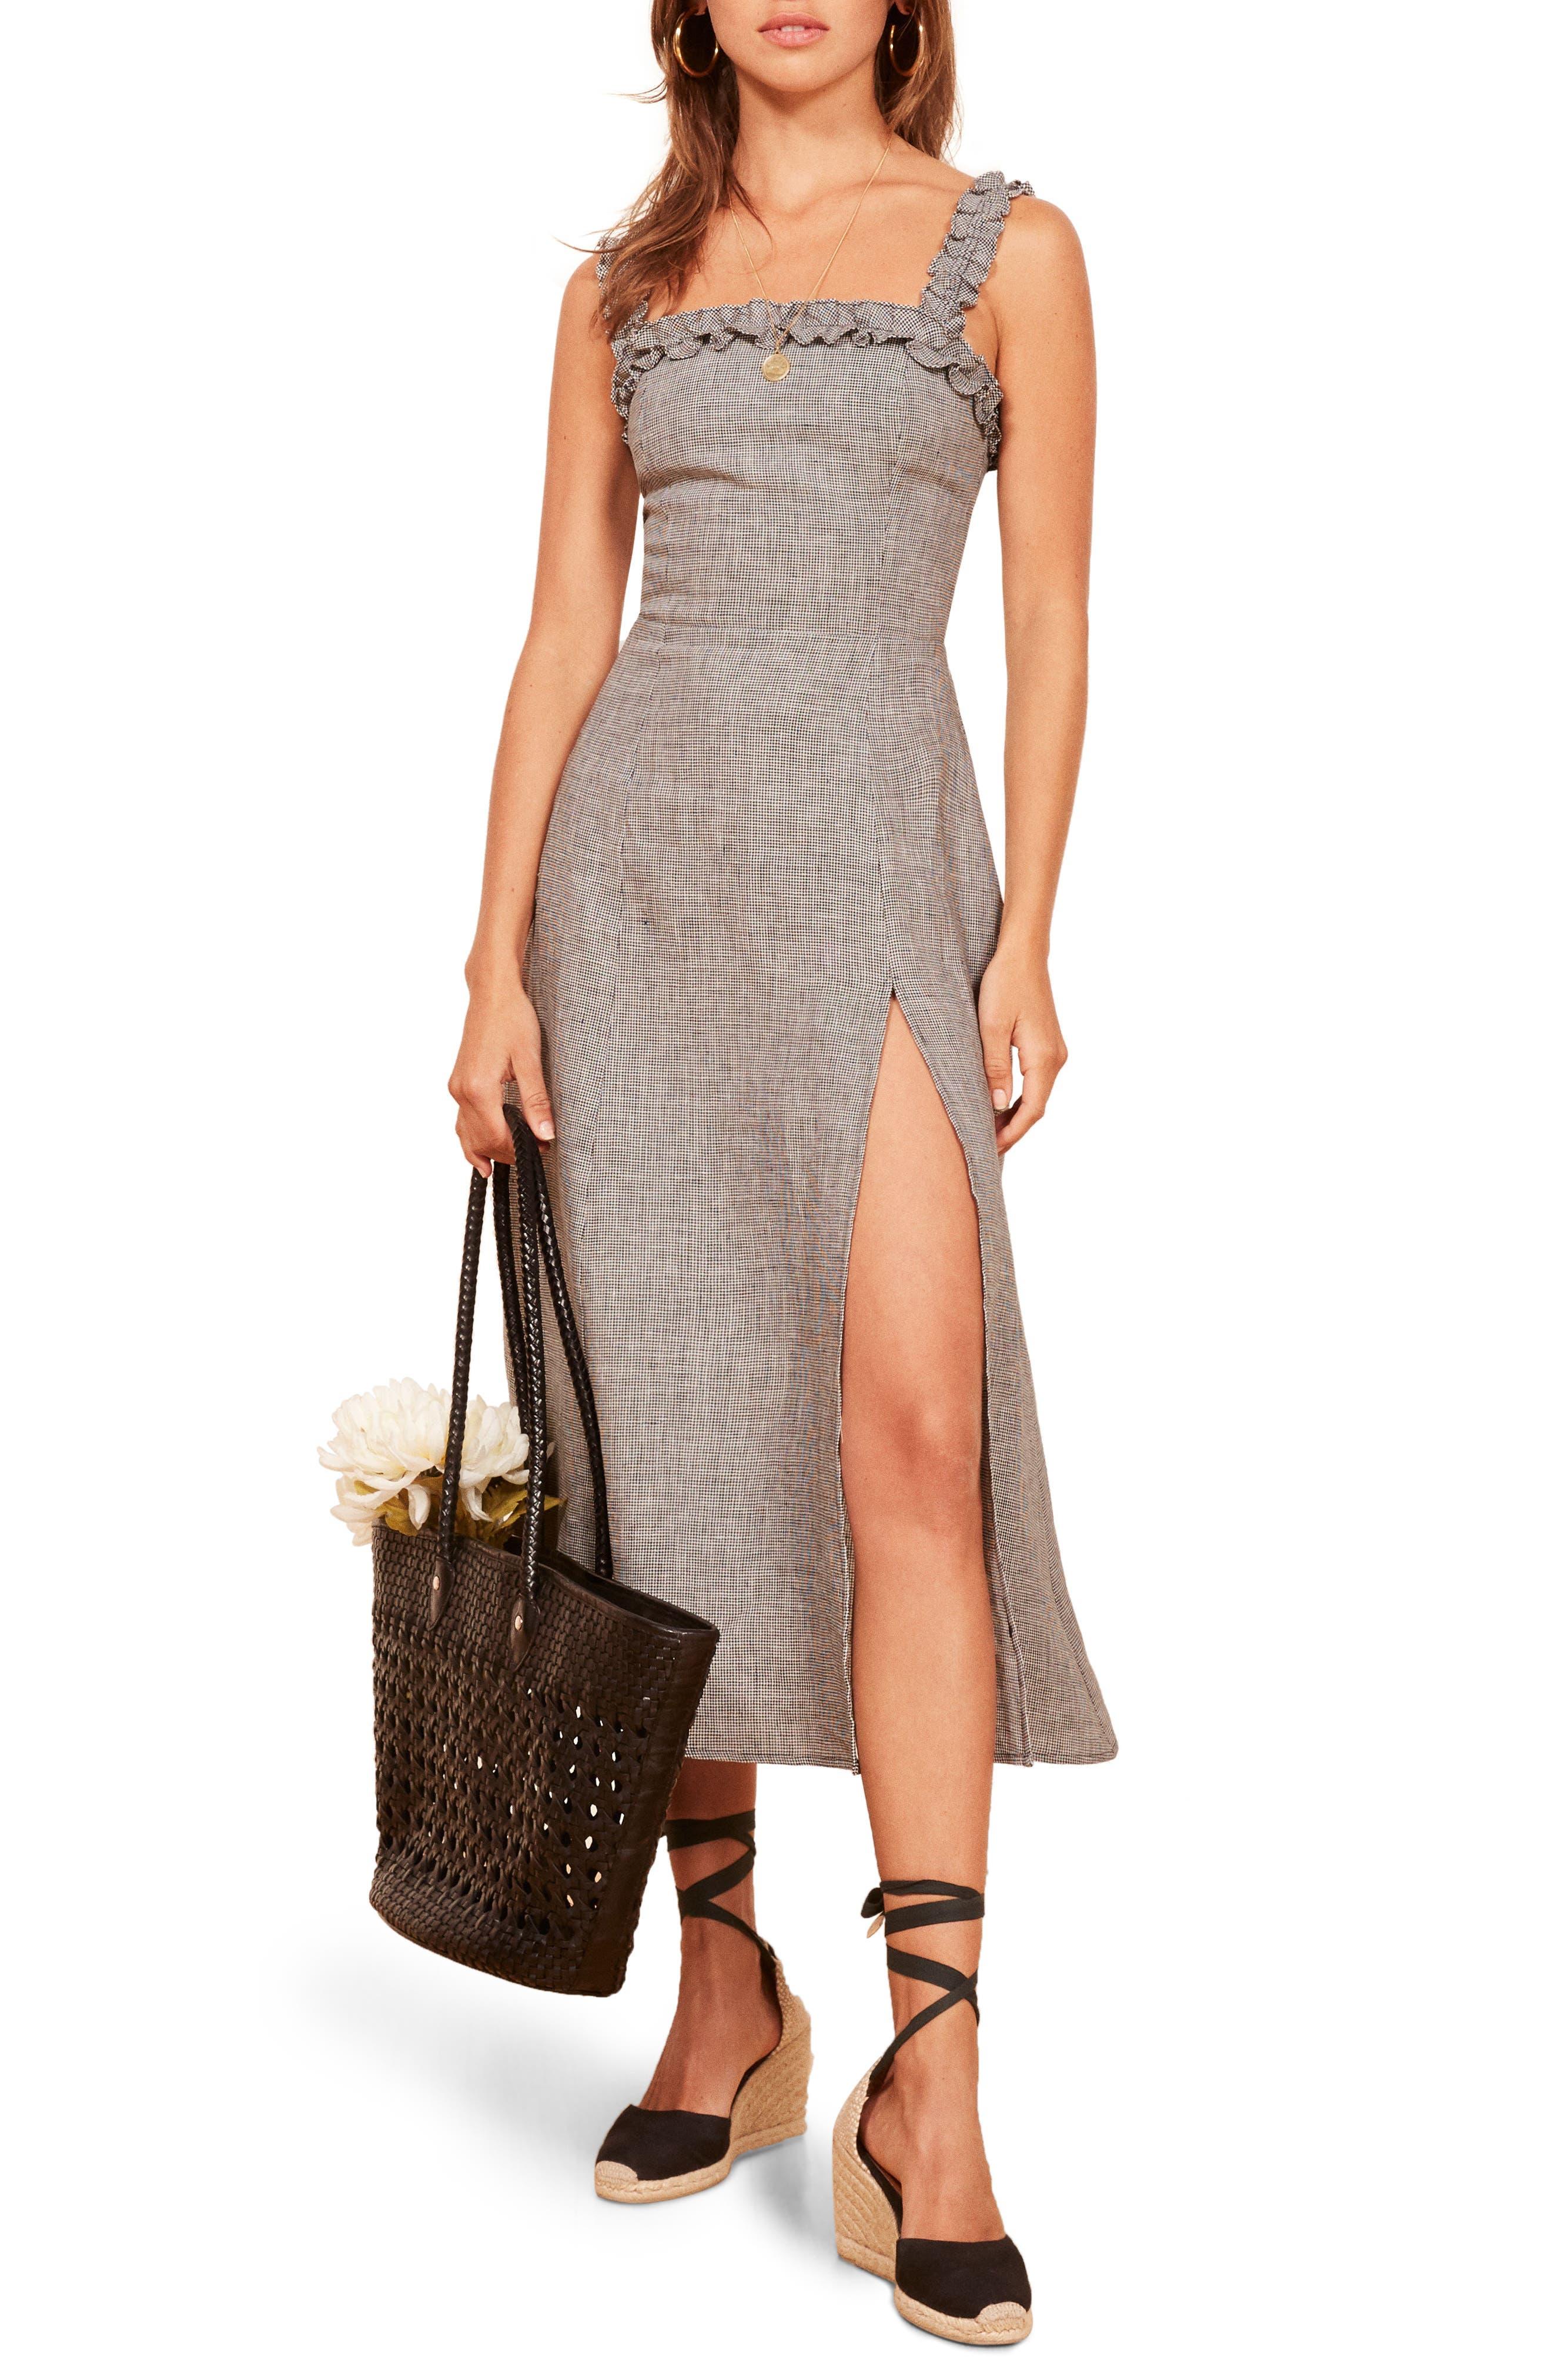 REFORMATION Lavender Front Slit Linen Midi Dress, Main, color, 001